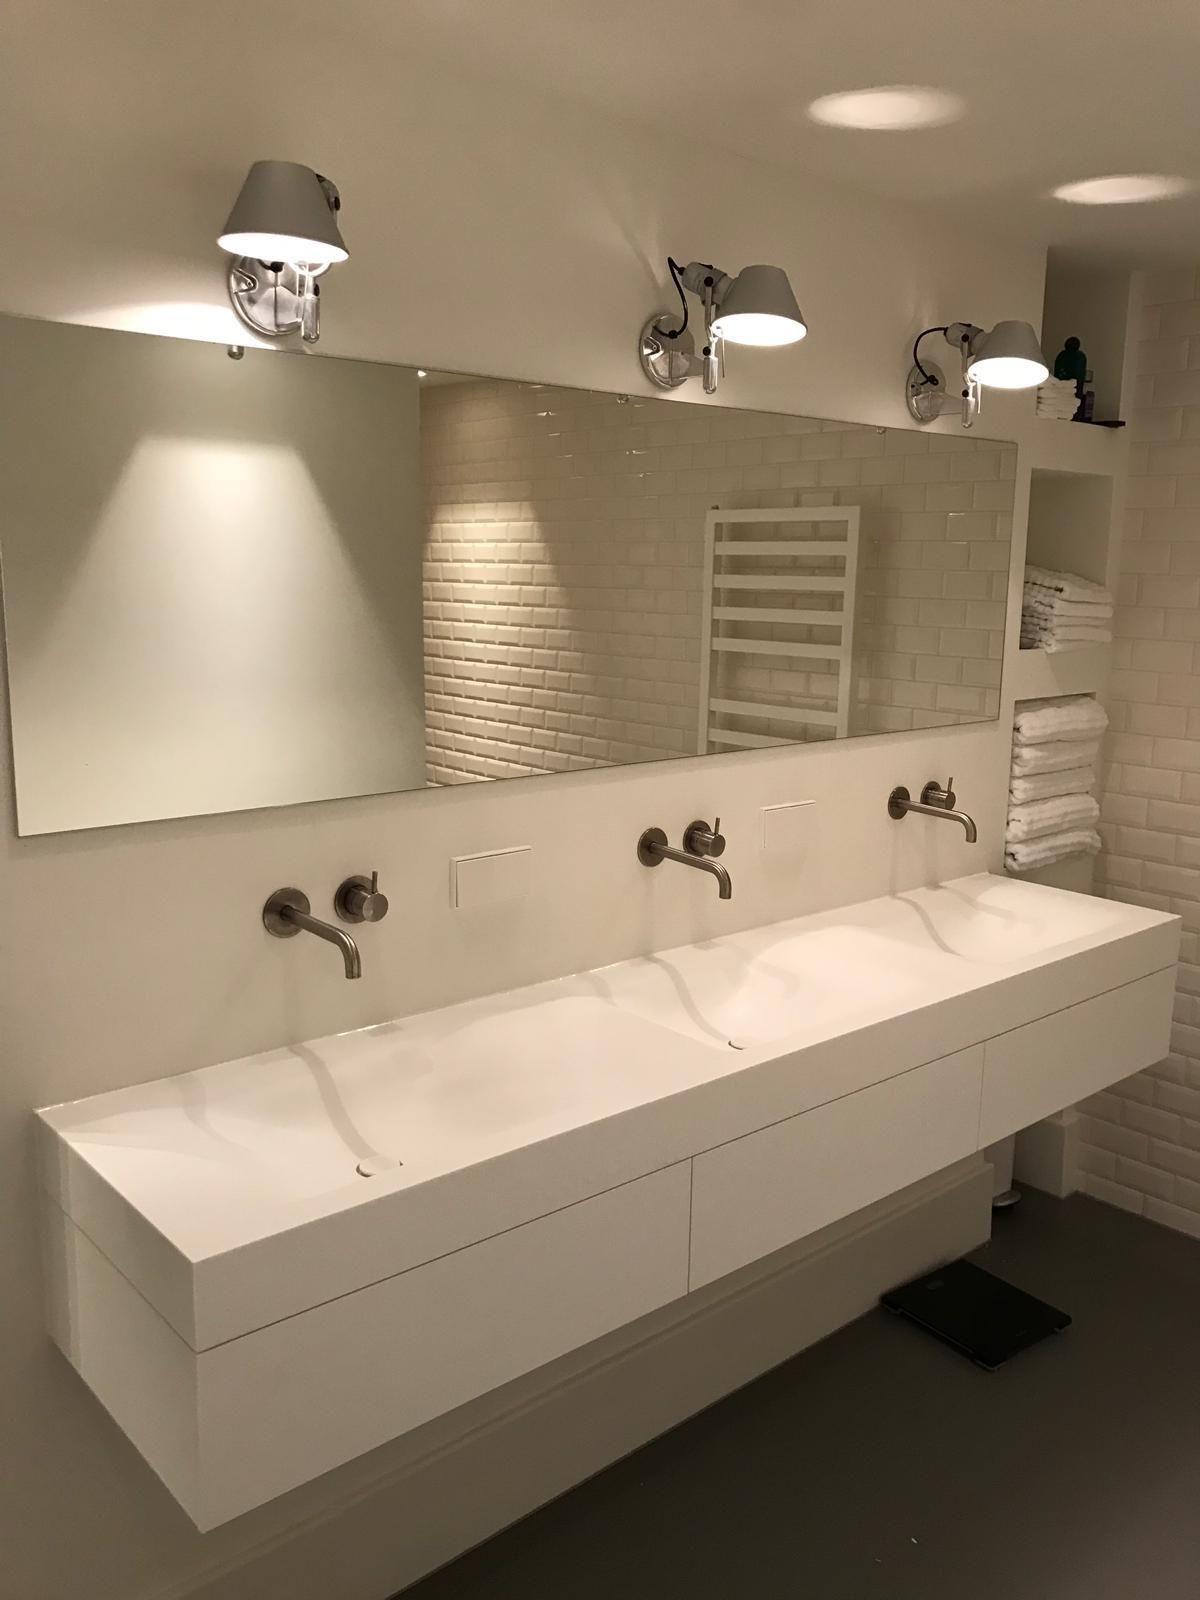 Tiz Design Kwaliteits Badkamermeubels Solid Surface Badkamer Nieuwbouw Wastafel Badkamer Inspiratie